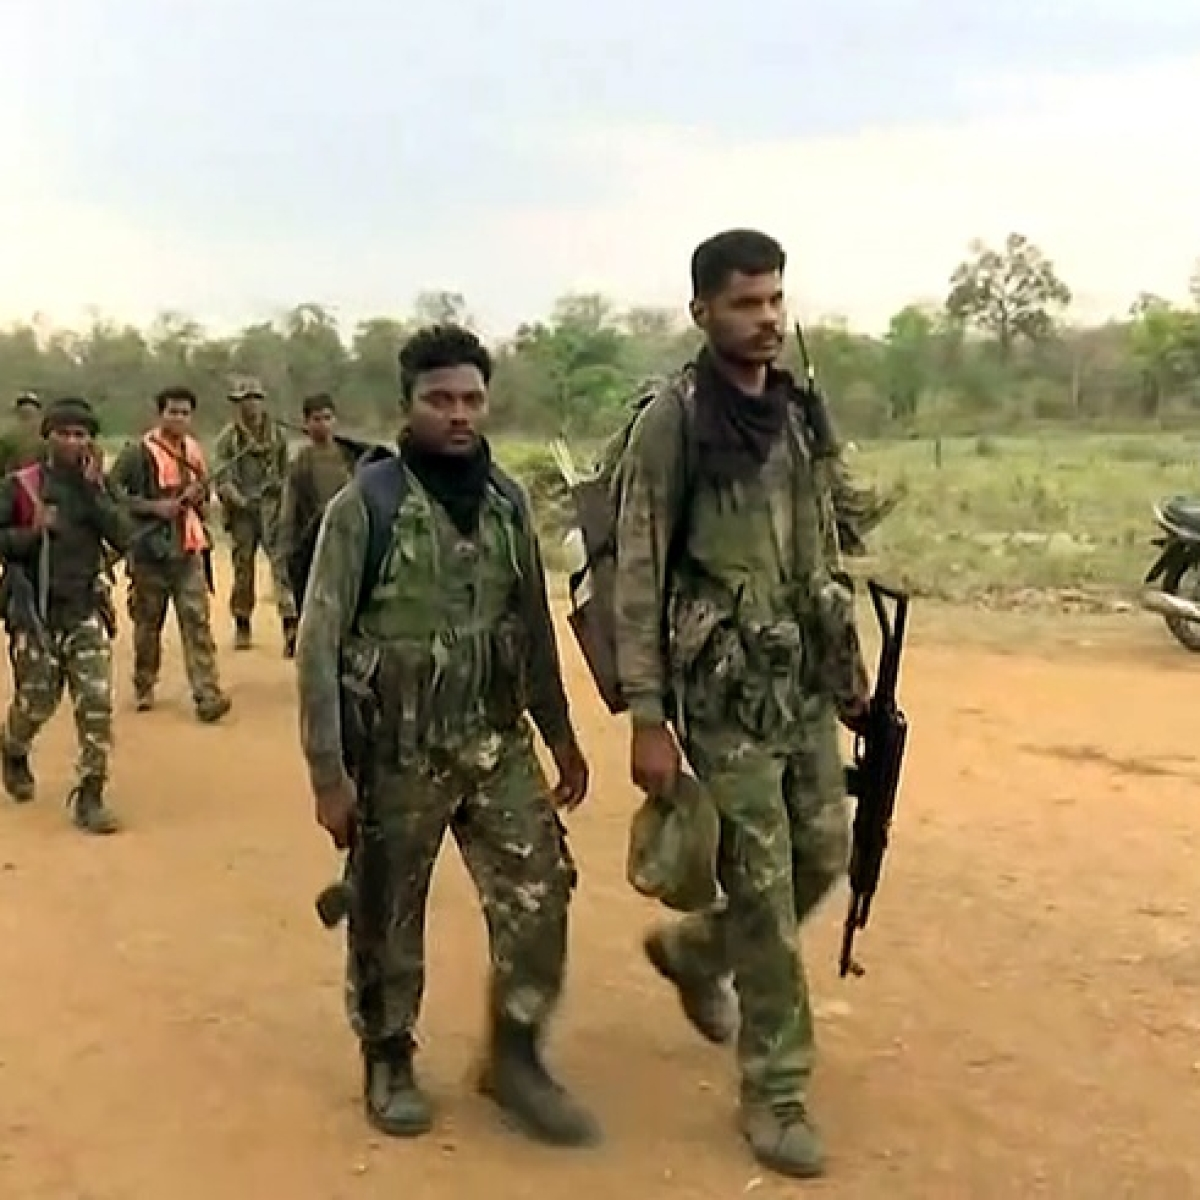 17 security personnel killed in encounter with Naxals in Chhattisgarh's Sukma